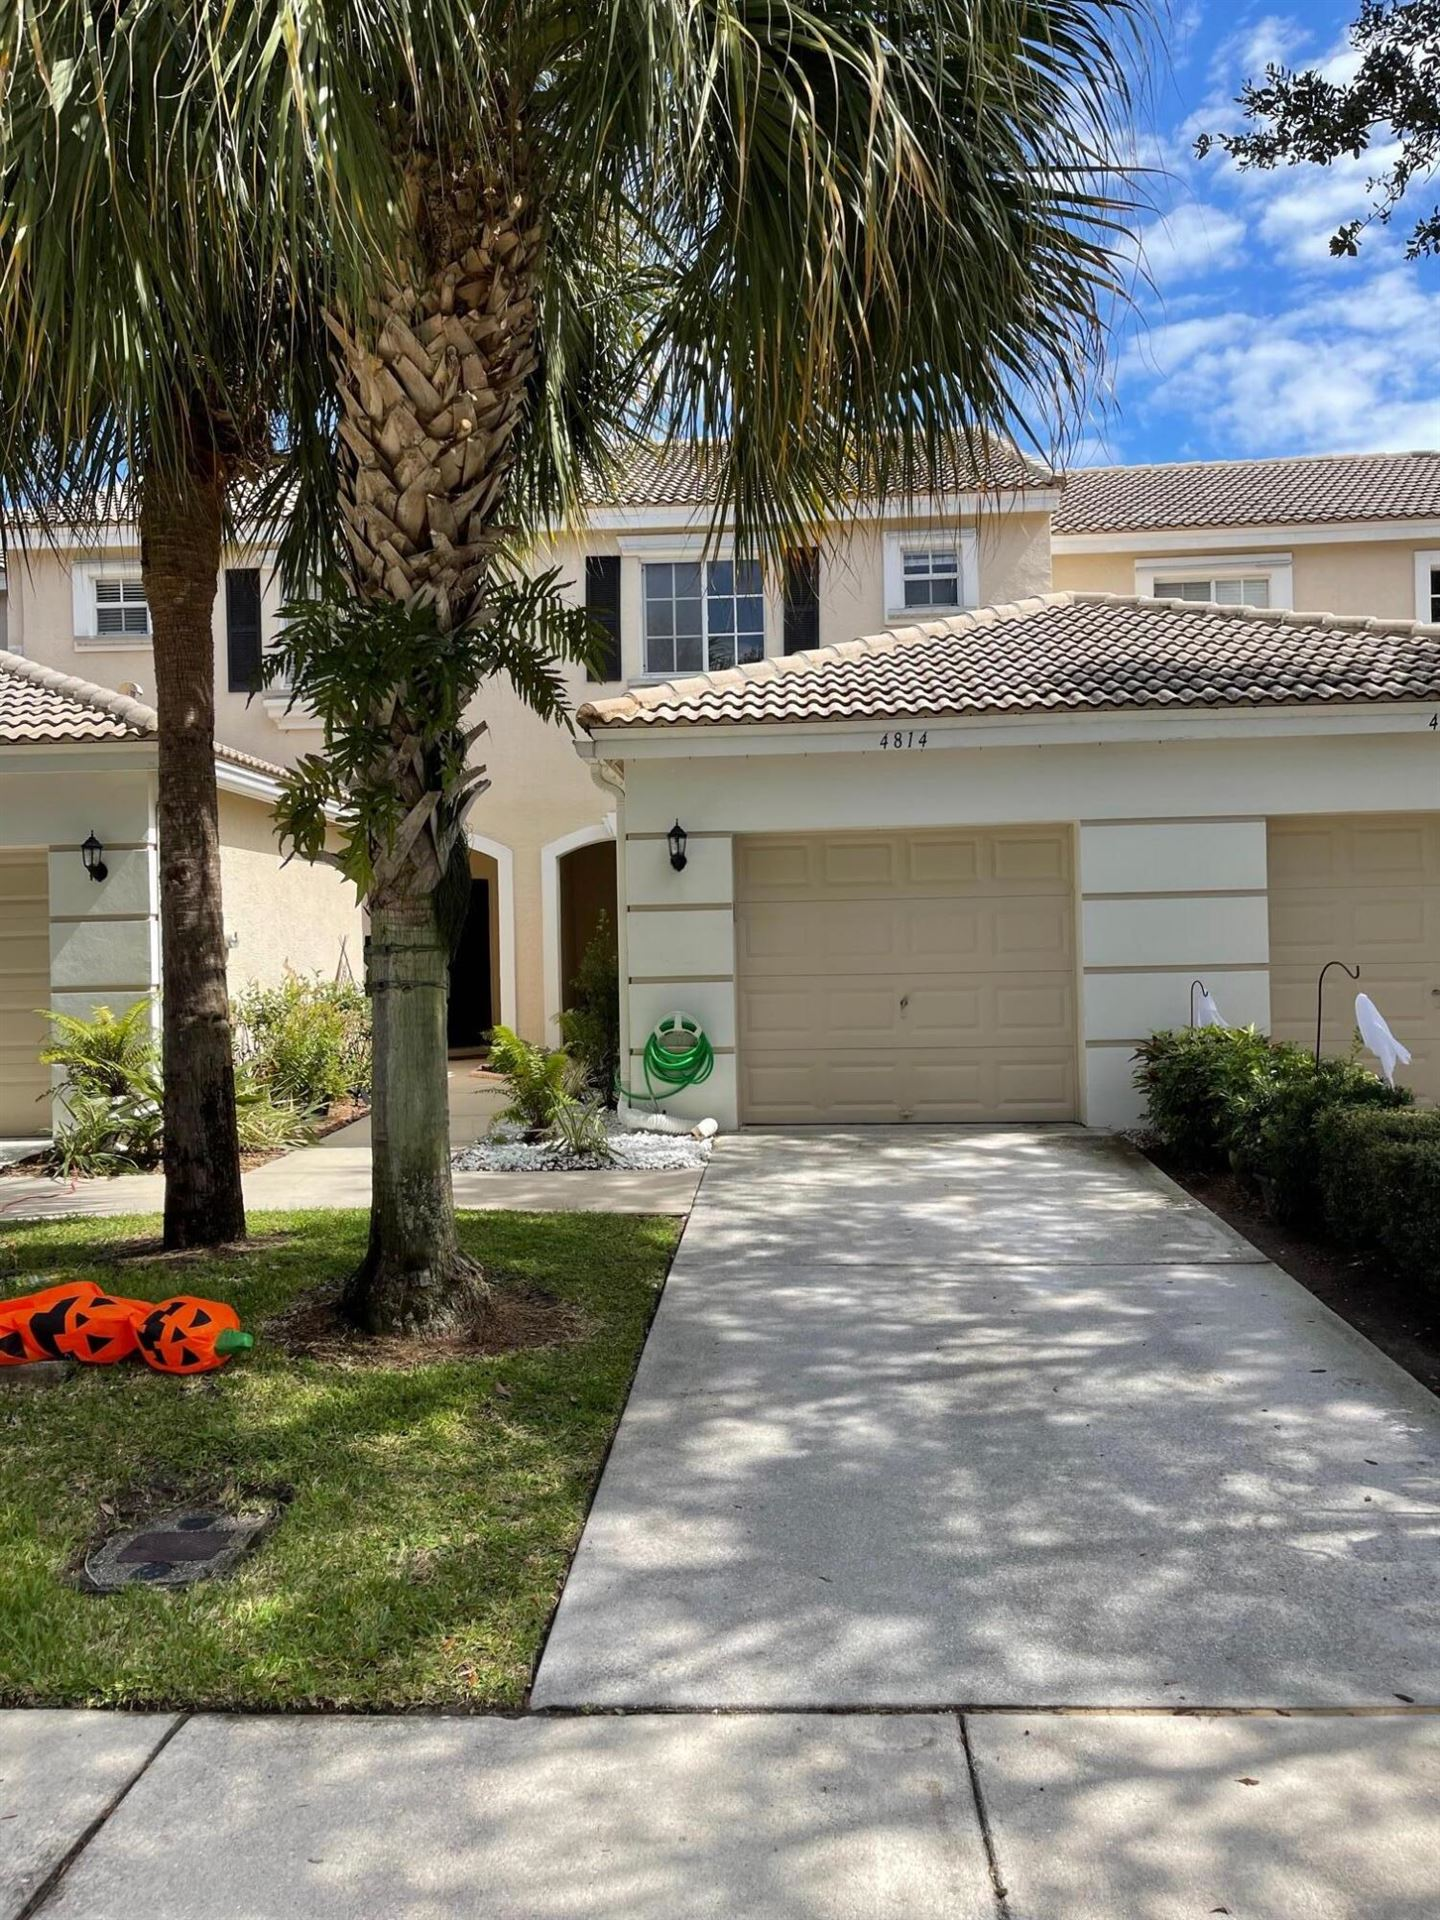 4814 Palmbrooke Circle, West Palm Beach, FL 33417 - #: RX-10754662